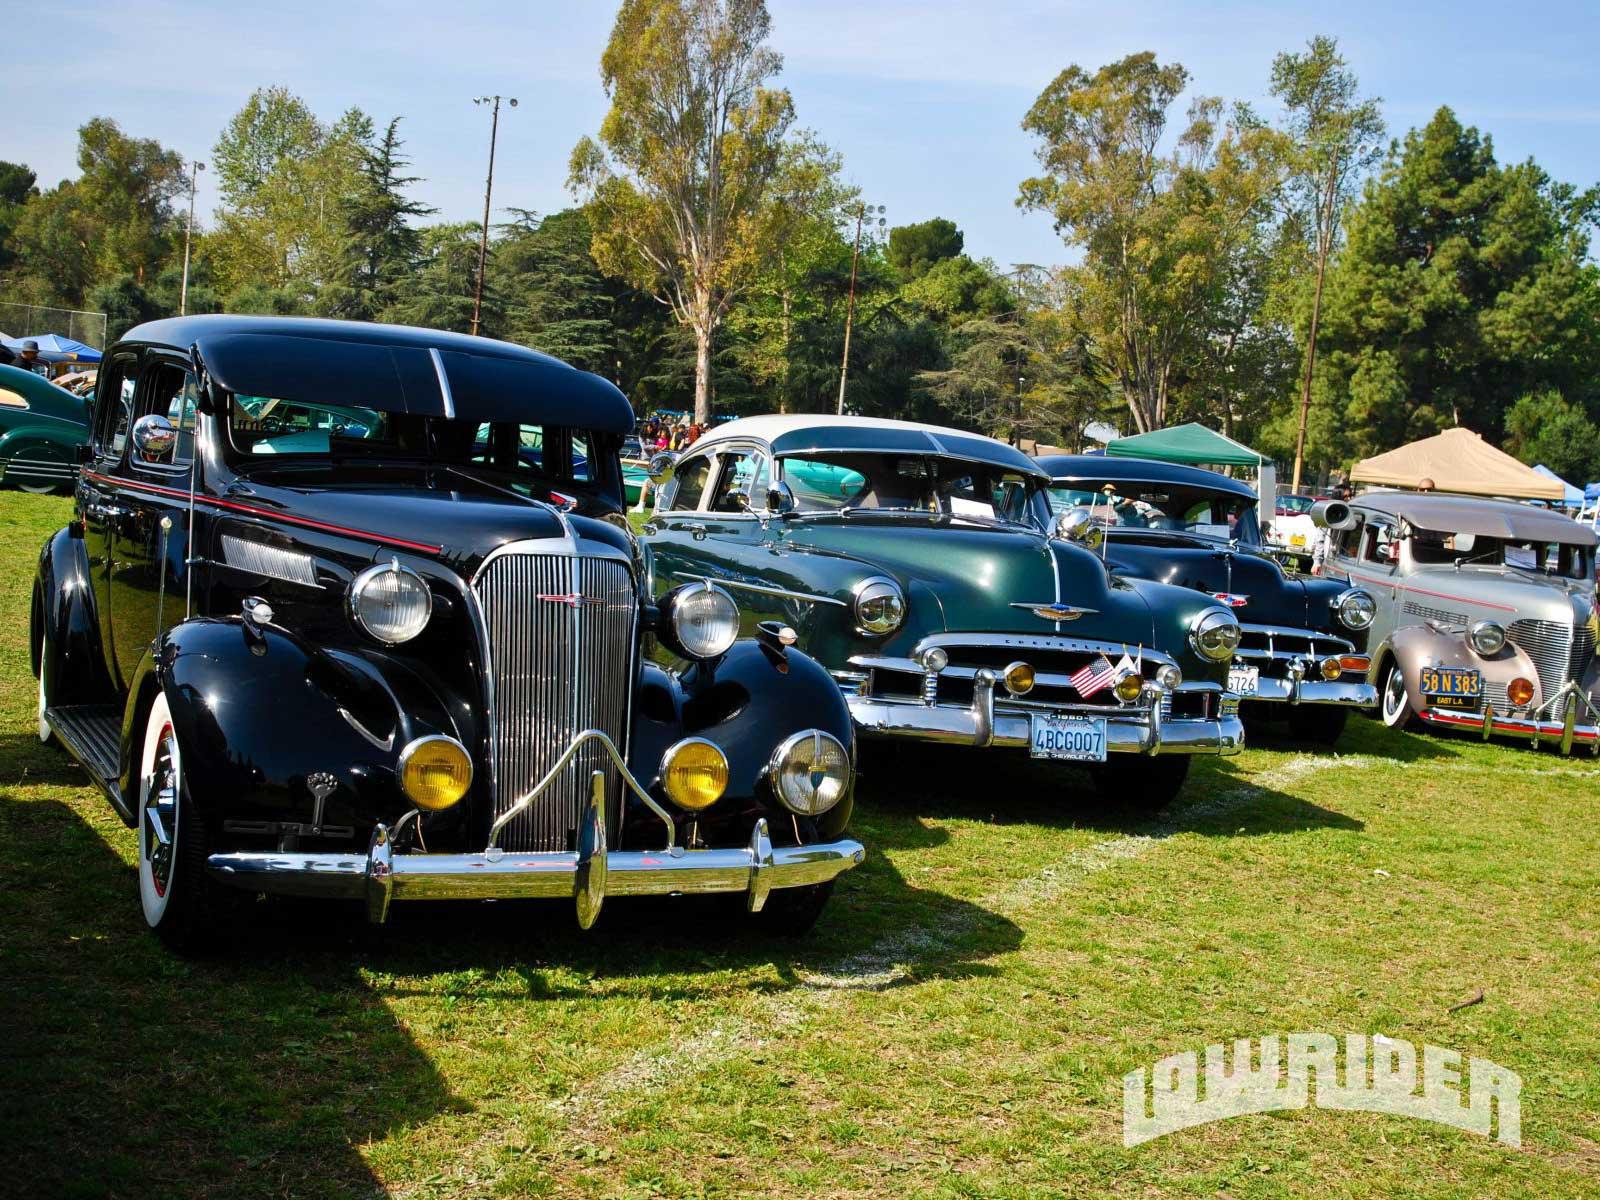 Annual Greenspan S Classic Car Show Lowrider Magazine